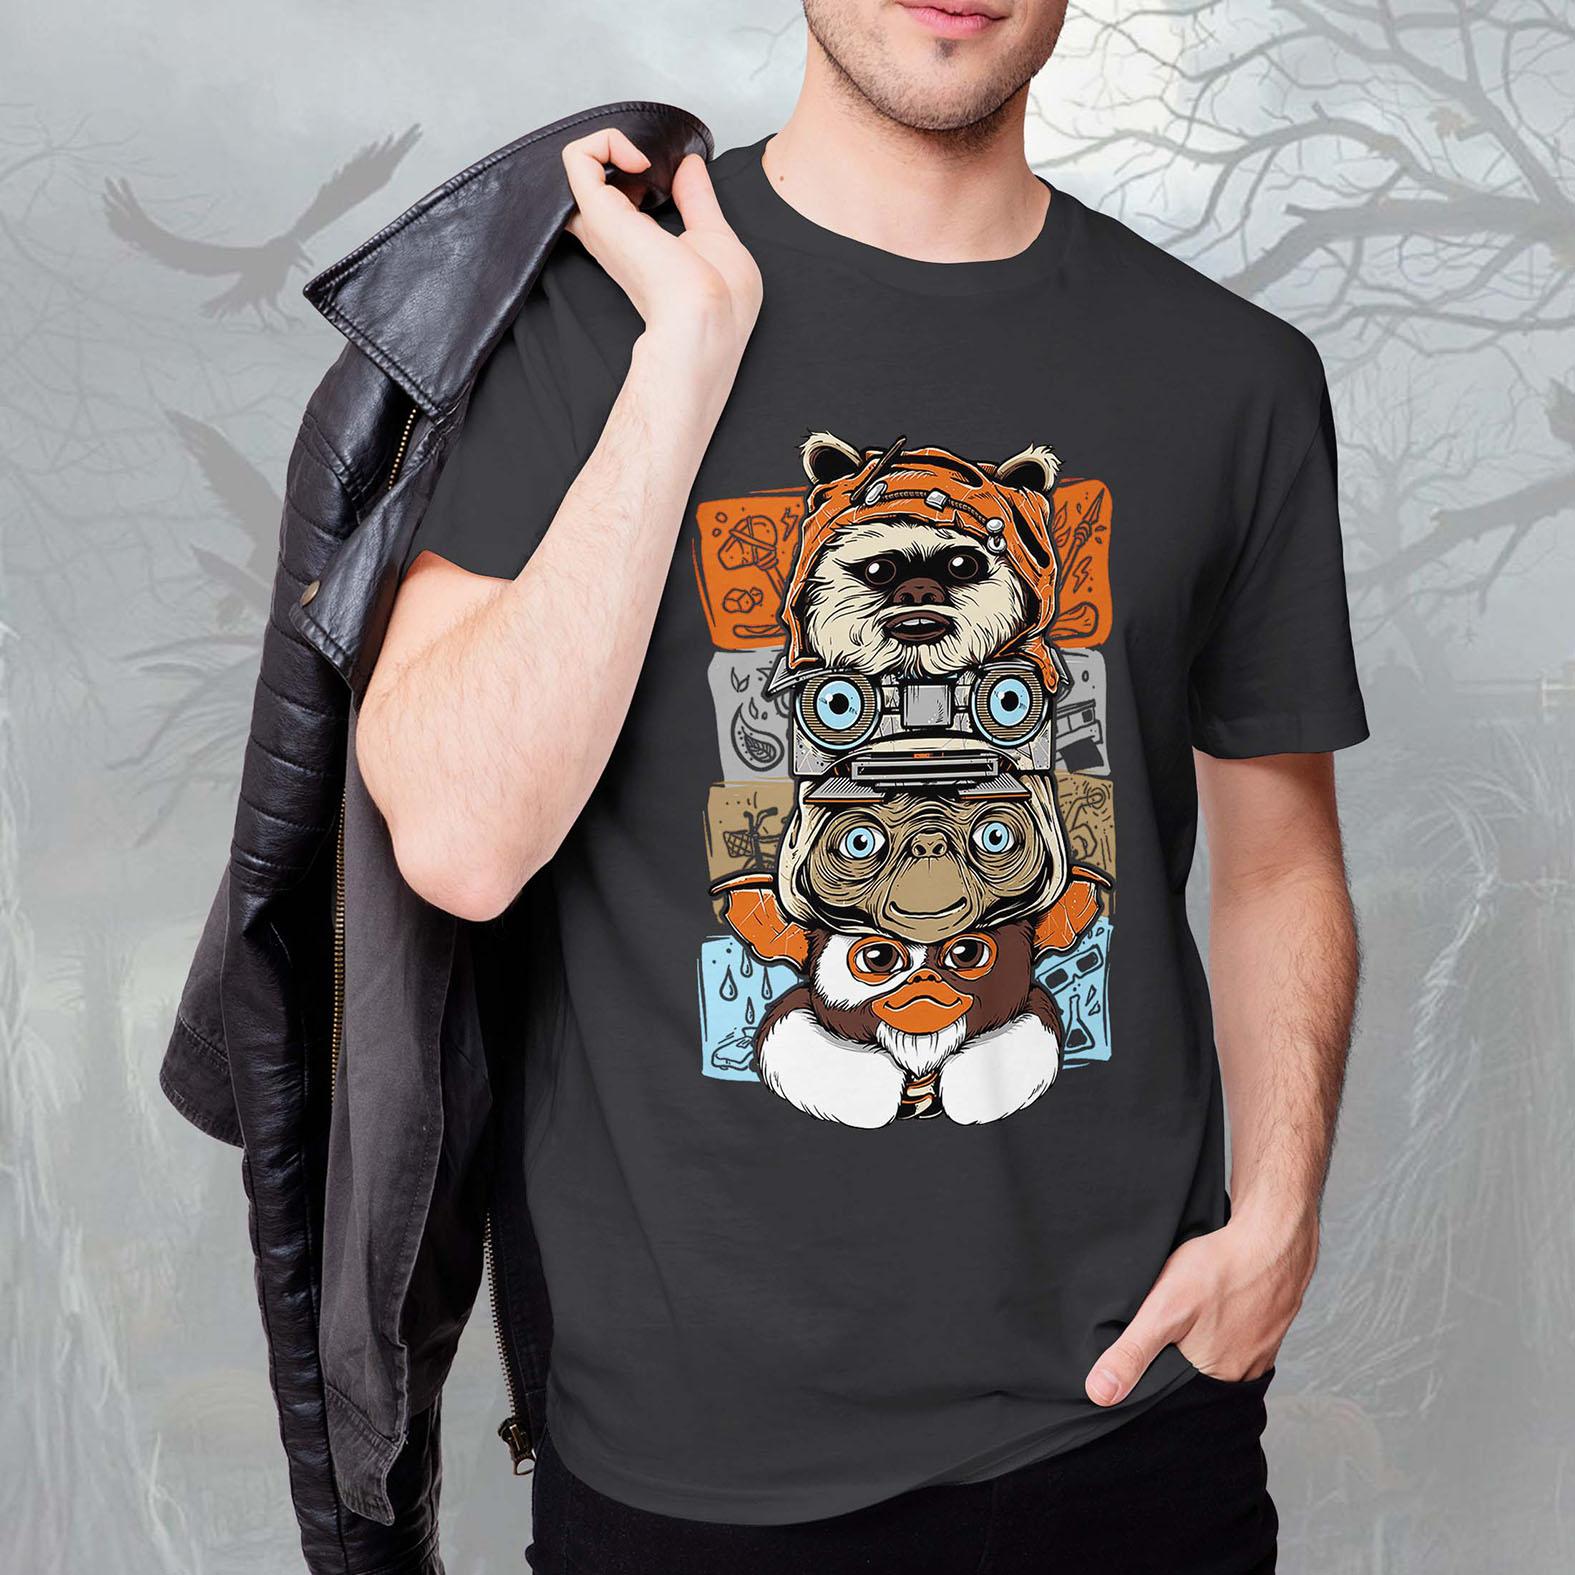 Camiseta Masculina Unissex Ewoks Johnny Five Et Extraterrestre Mogwai Gremlins Monsters Horror (Cinza Chumbo) - EV